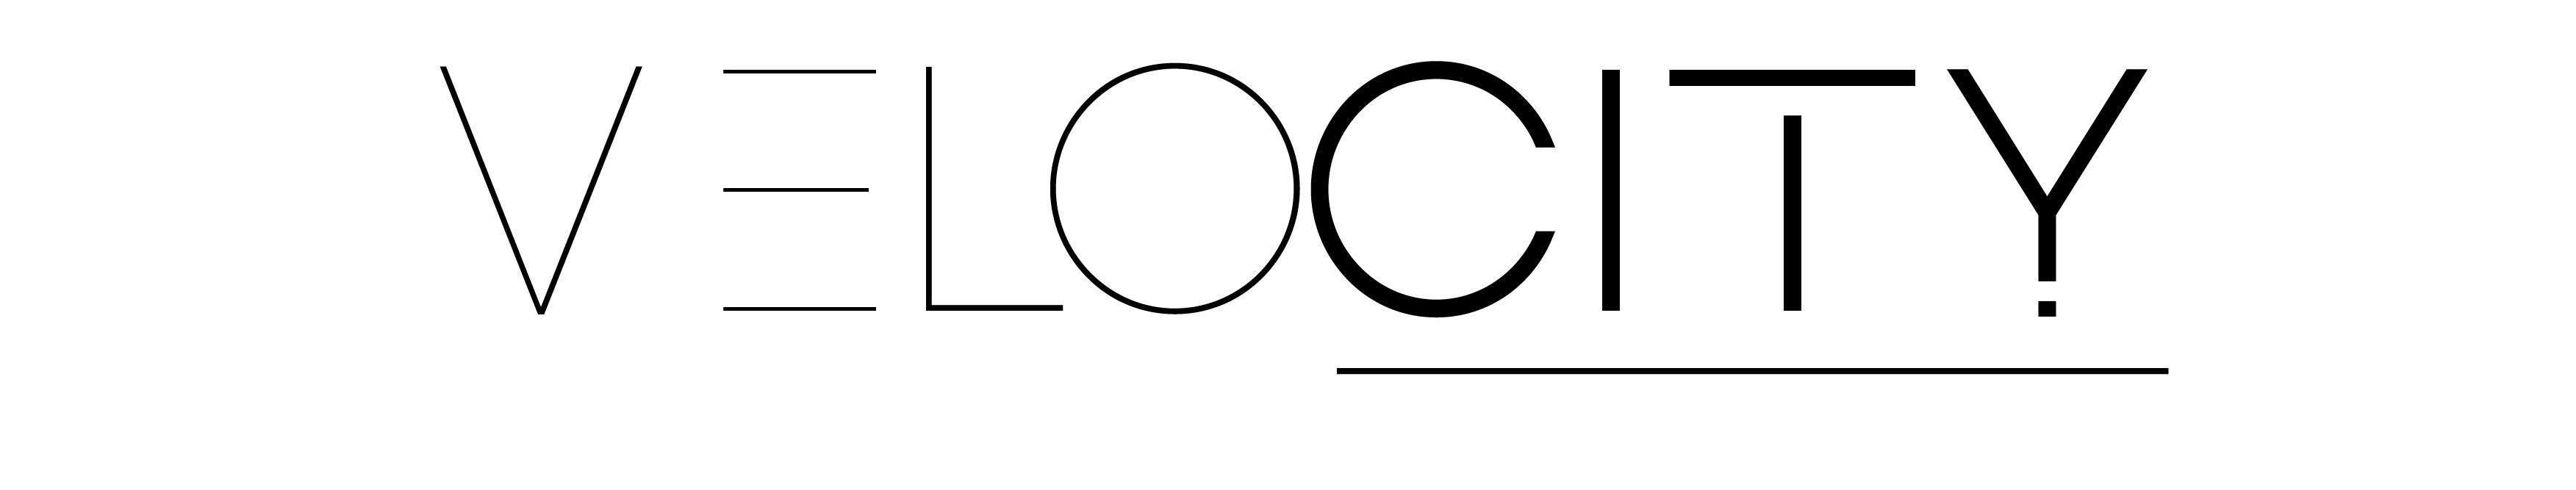 Velocity Media Logo